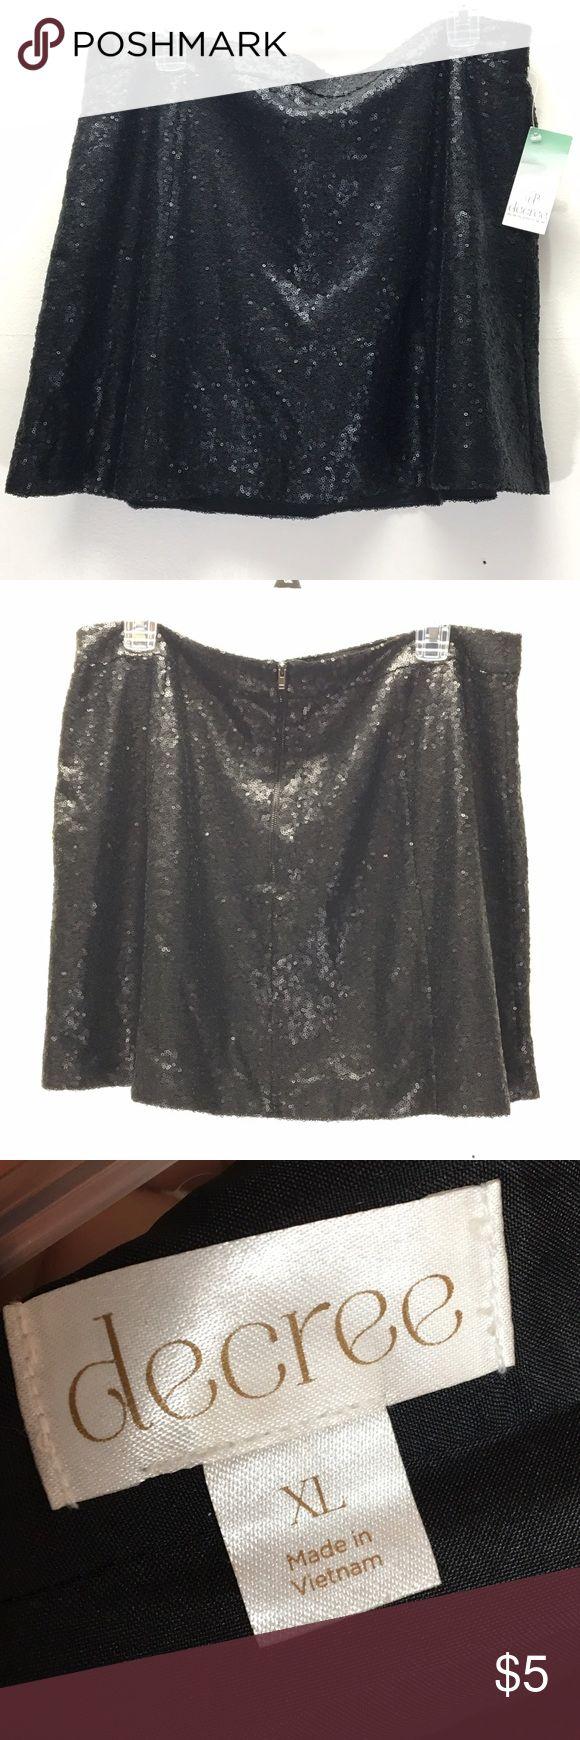 Black Sequins Skirt Brand new sequins skirt never worn! Decree Skirts